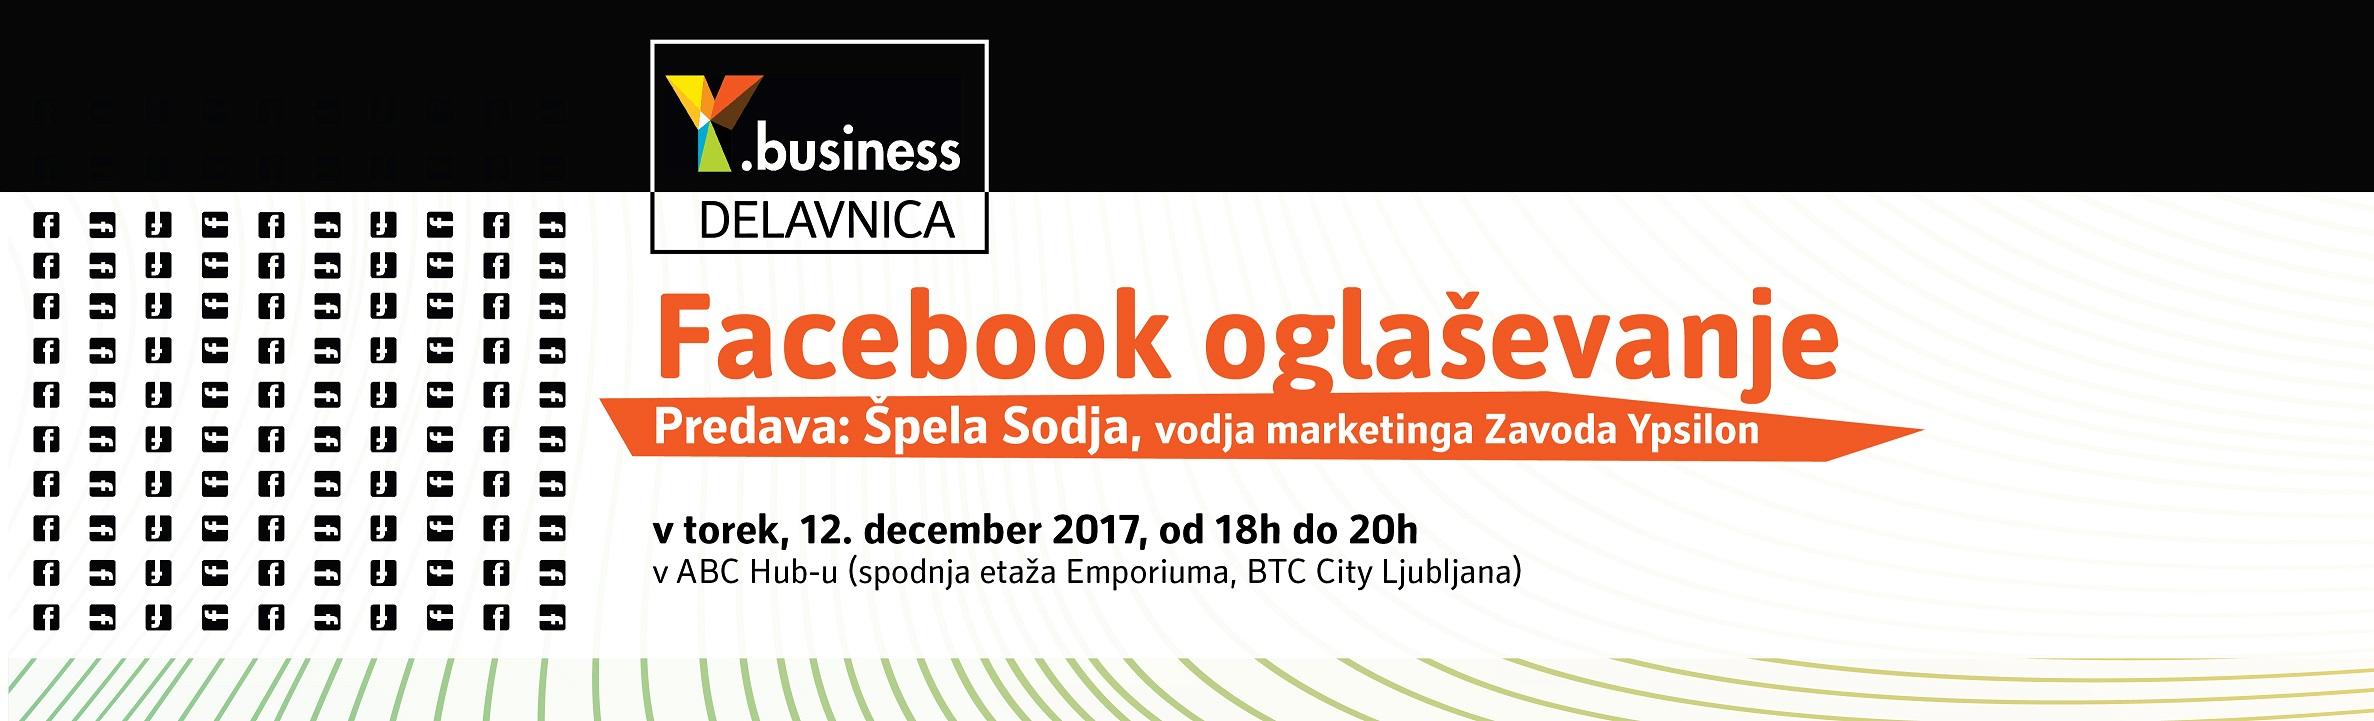 facebook oglasevanje delavnice december ypislon ybusiness 03